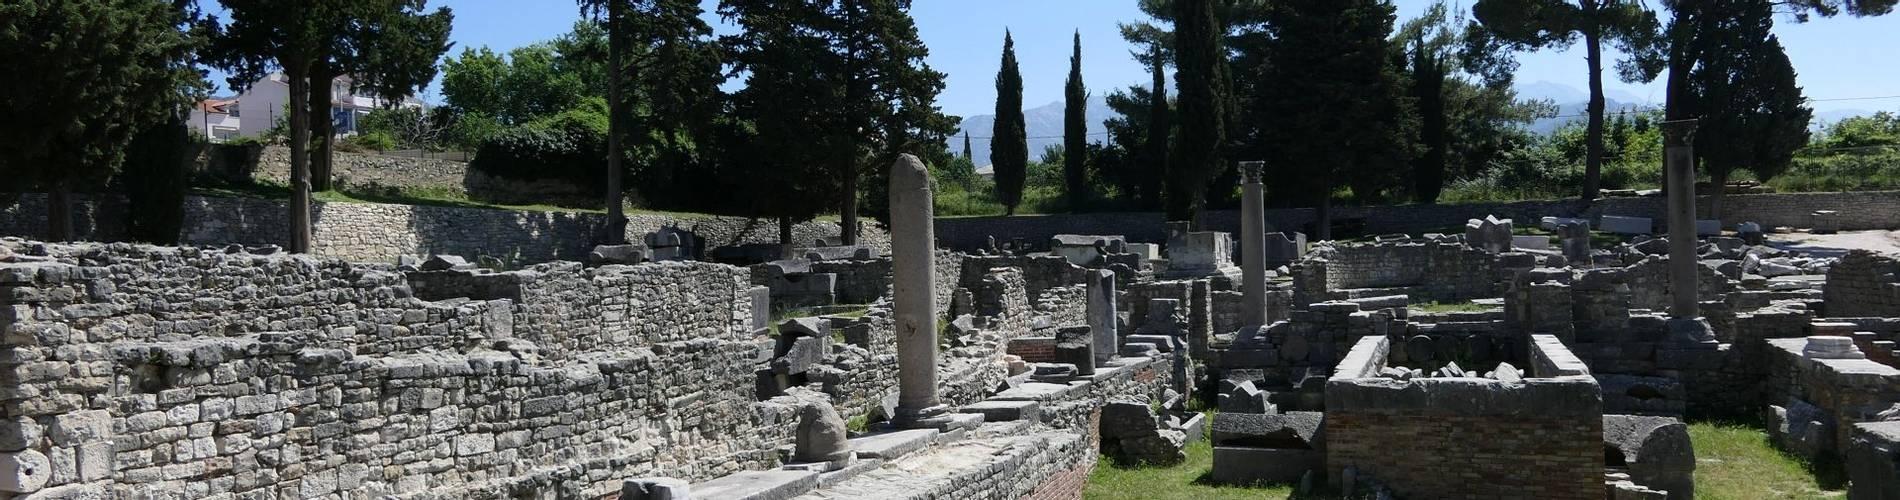 Roman ruins, Salona, Solin, Completely Croatia.JPG